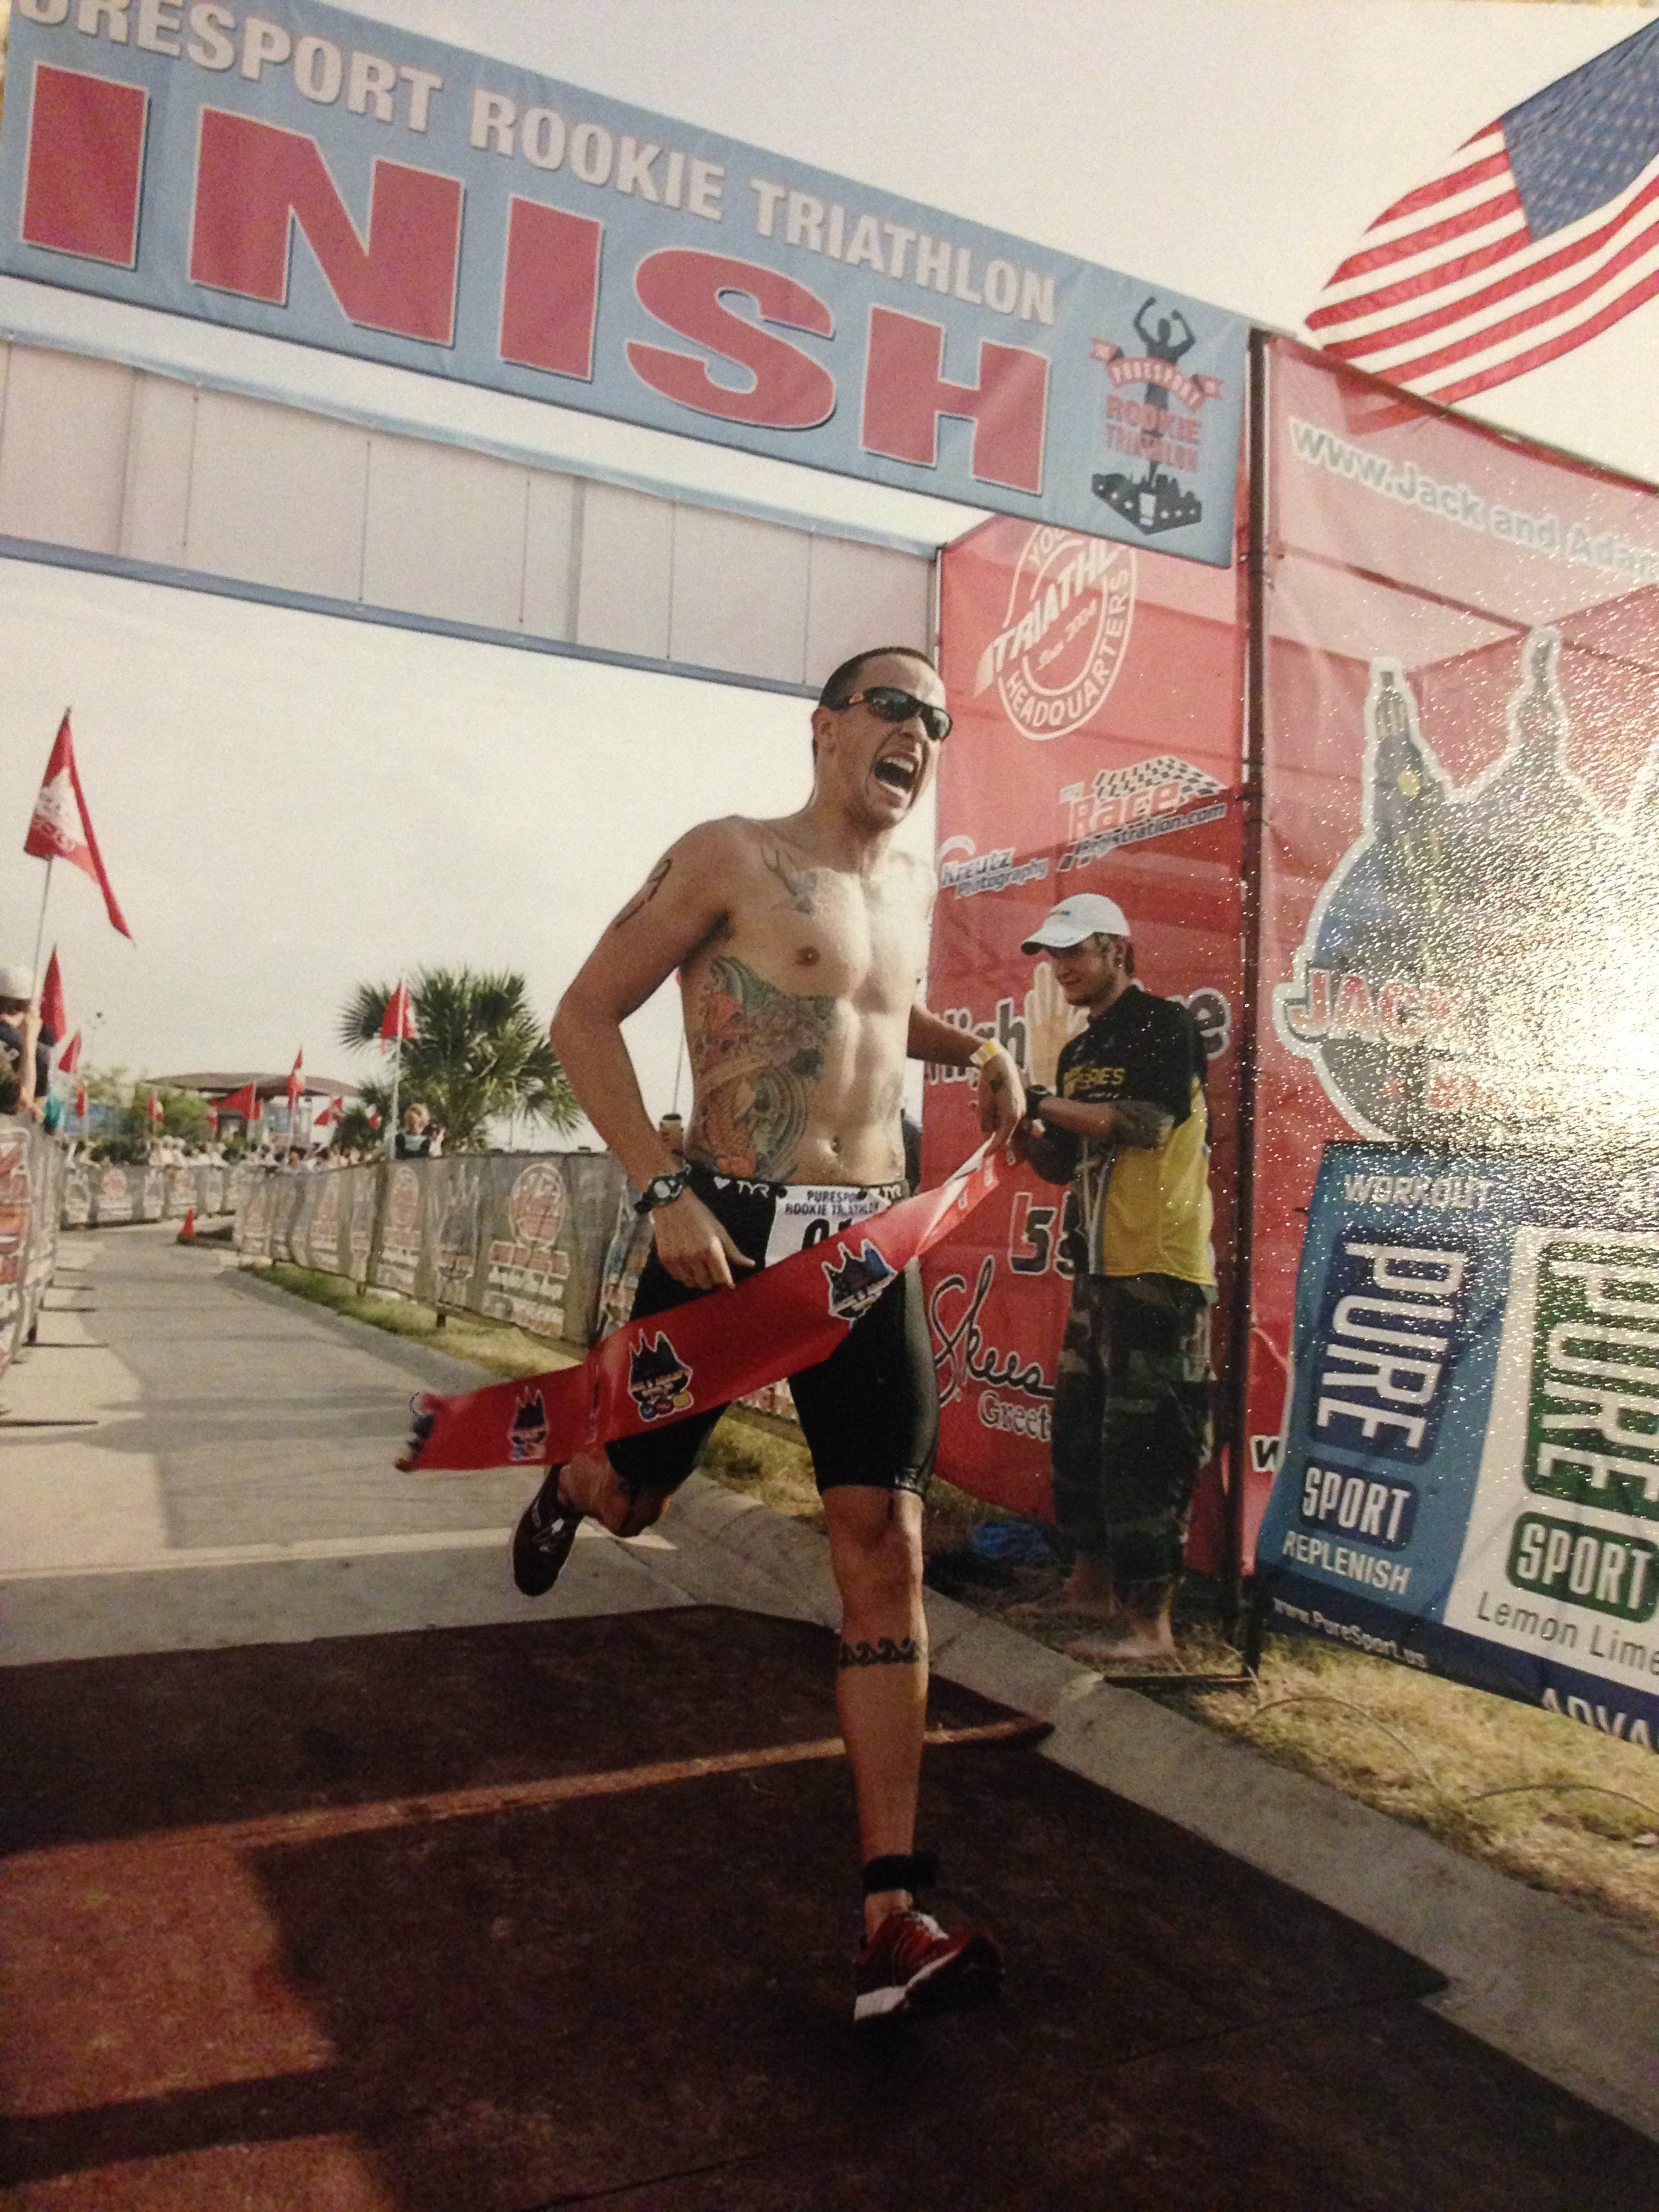 Tim Krauss - Austin, TX - Trail running, being a dad & husband!!!!